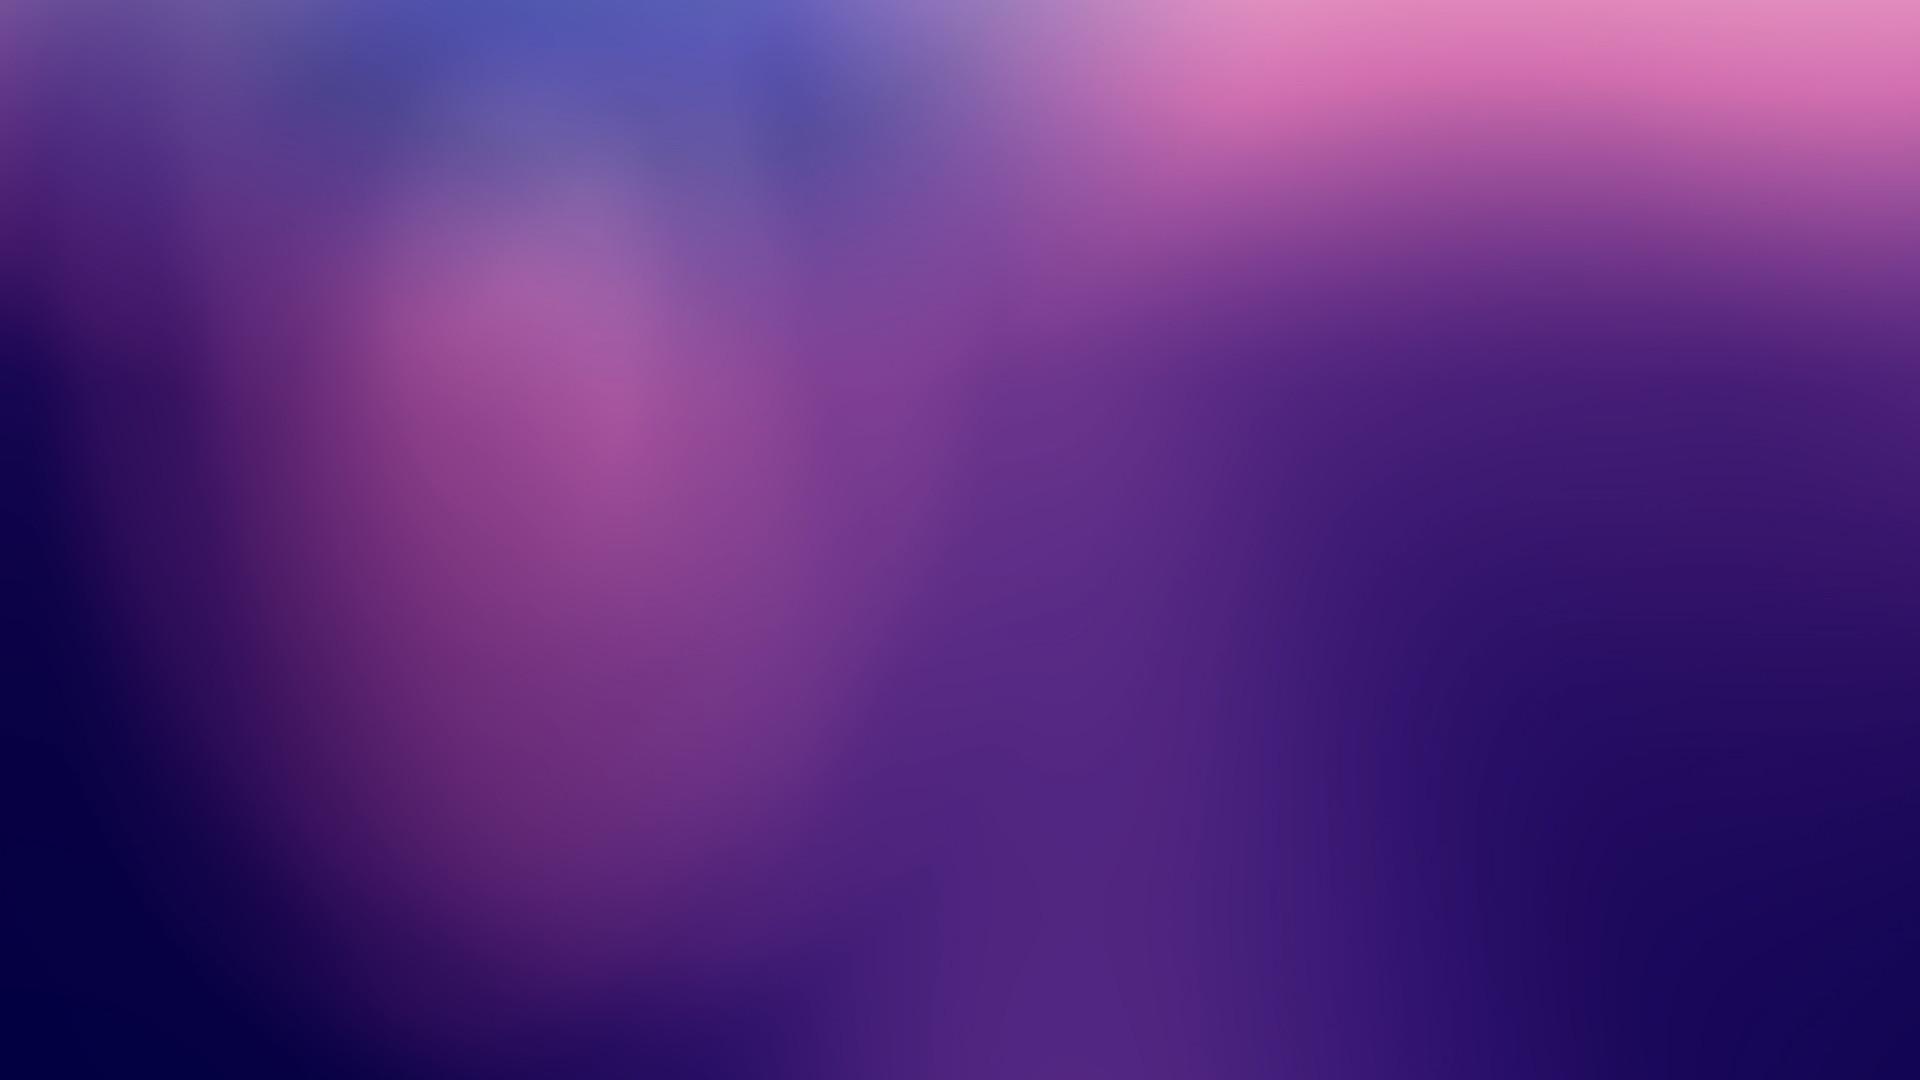 Purple Backgrounds 18528